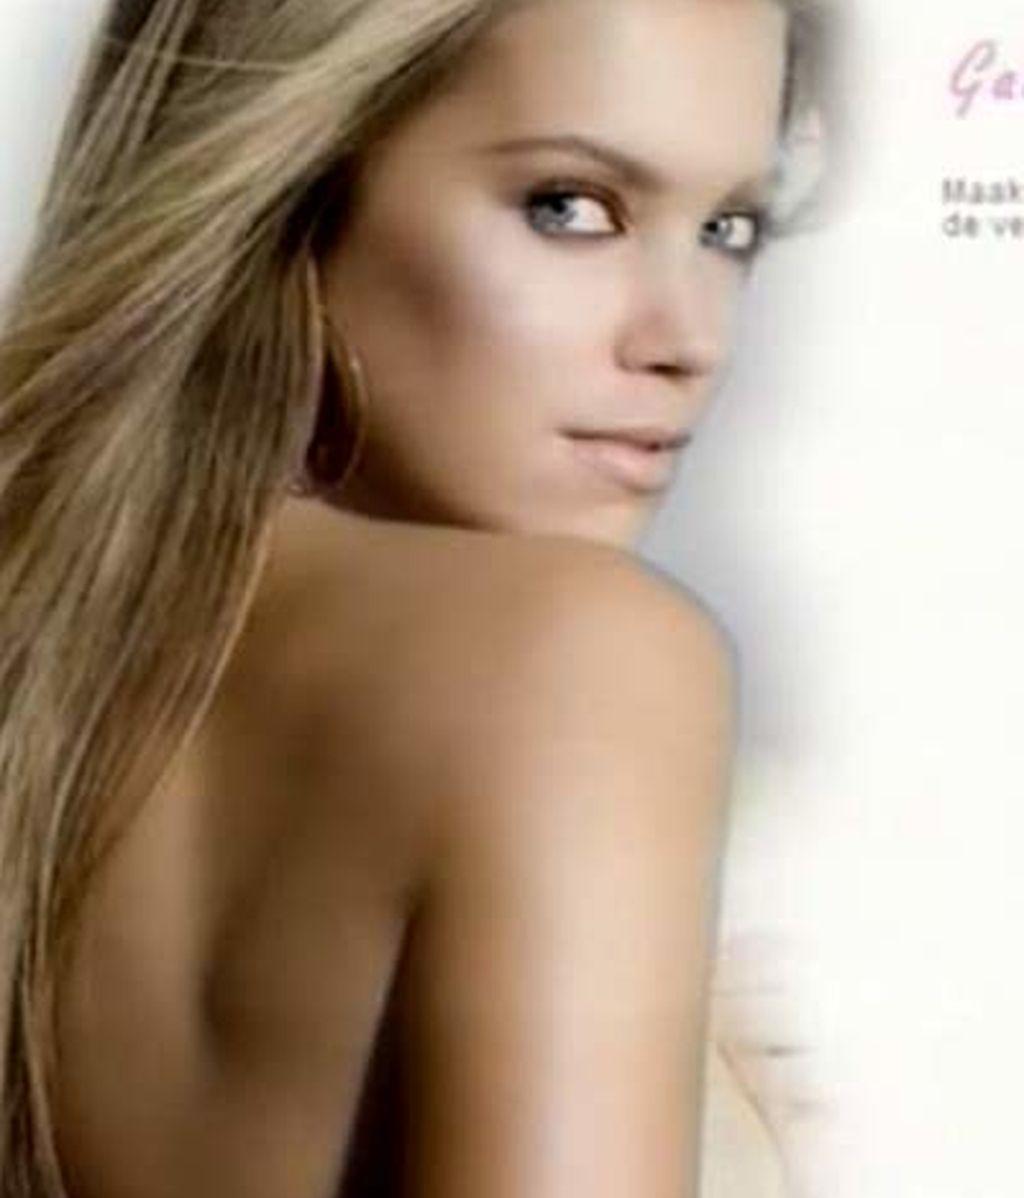 La nueva Victoria Beckham